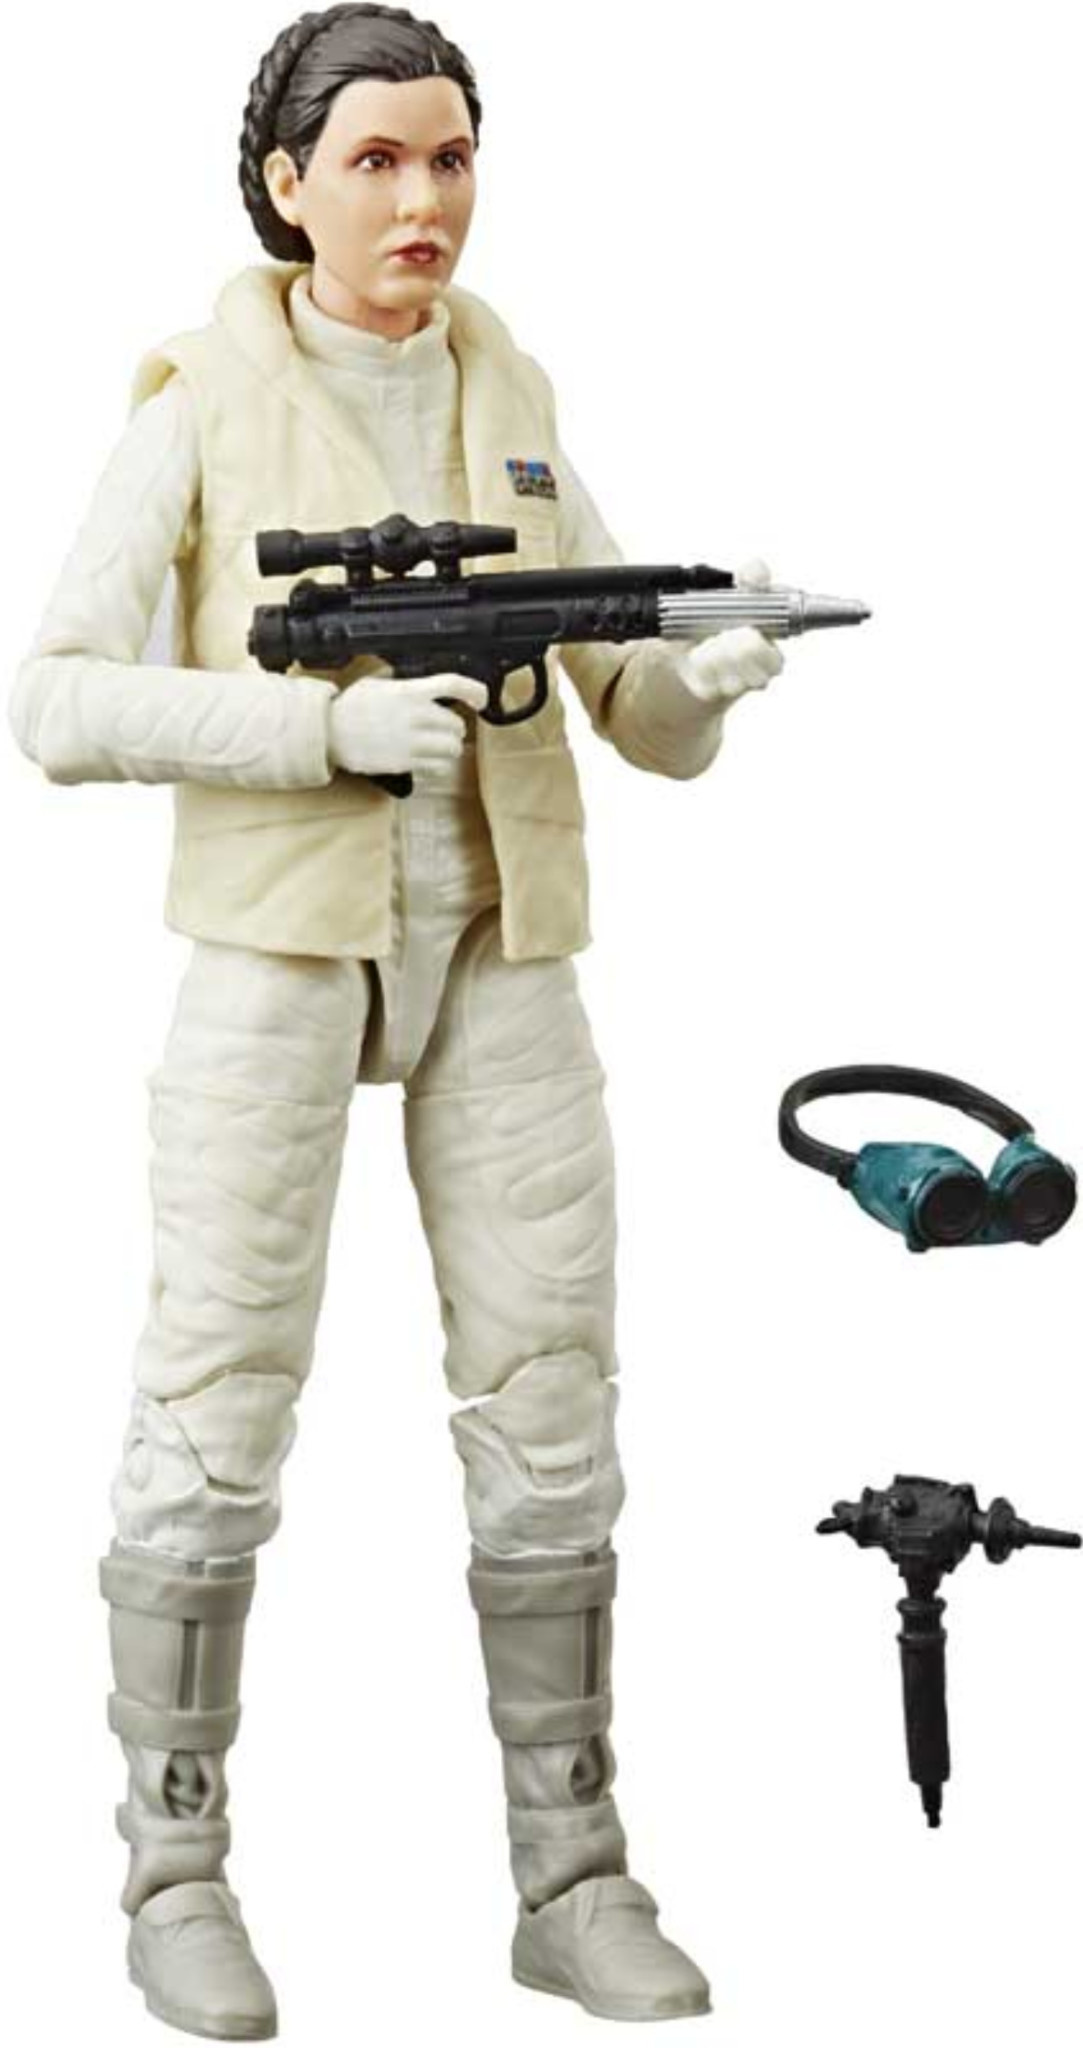 HASBRO Star Wars  E5 40TH  anniversary E5 Princess  Leia Organa